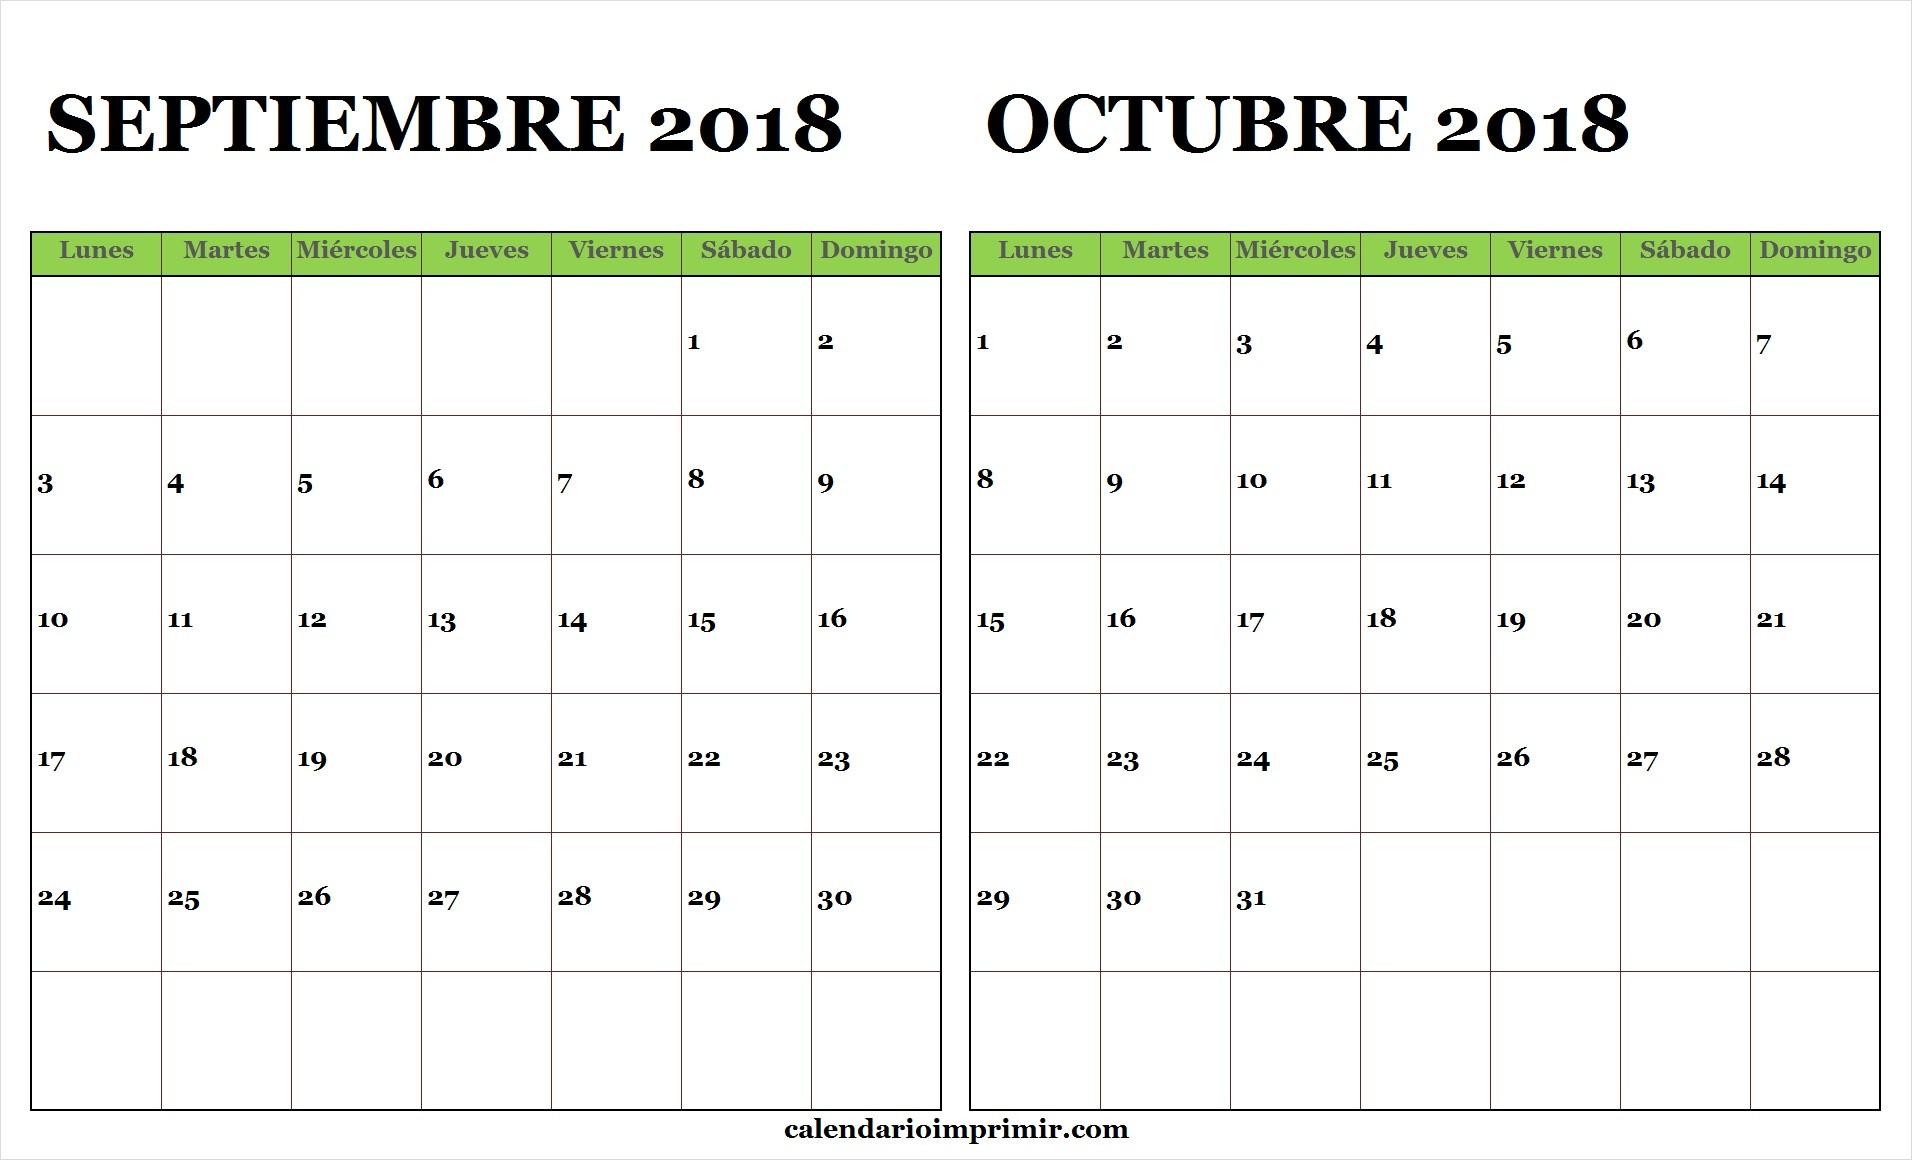 Calendário 2019 Com Feriados Download Más Arriba-a-fecha Calendario Octubre 2018 Colombia T Of Calendário 2019 Com Feriados Download Recientes Calendario Novembro 2018 Imprimir T